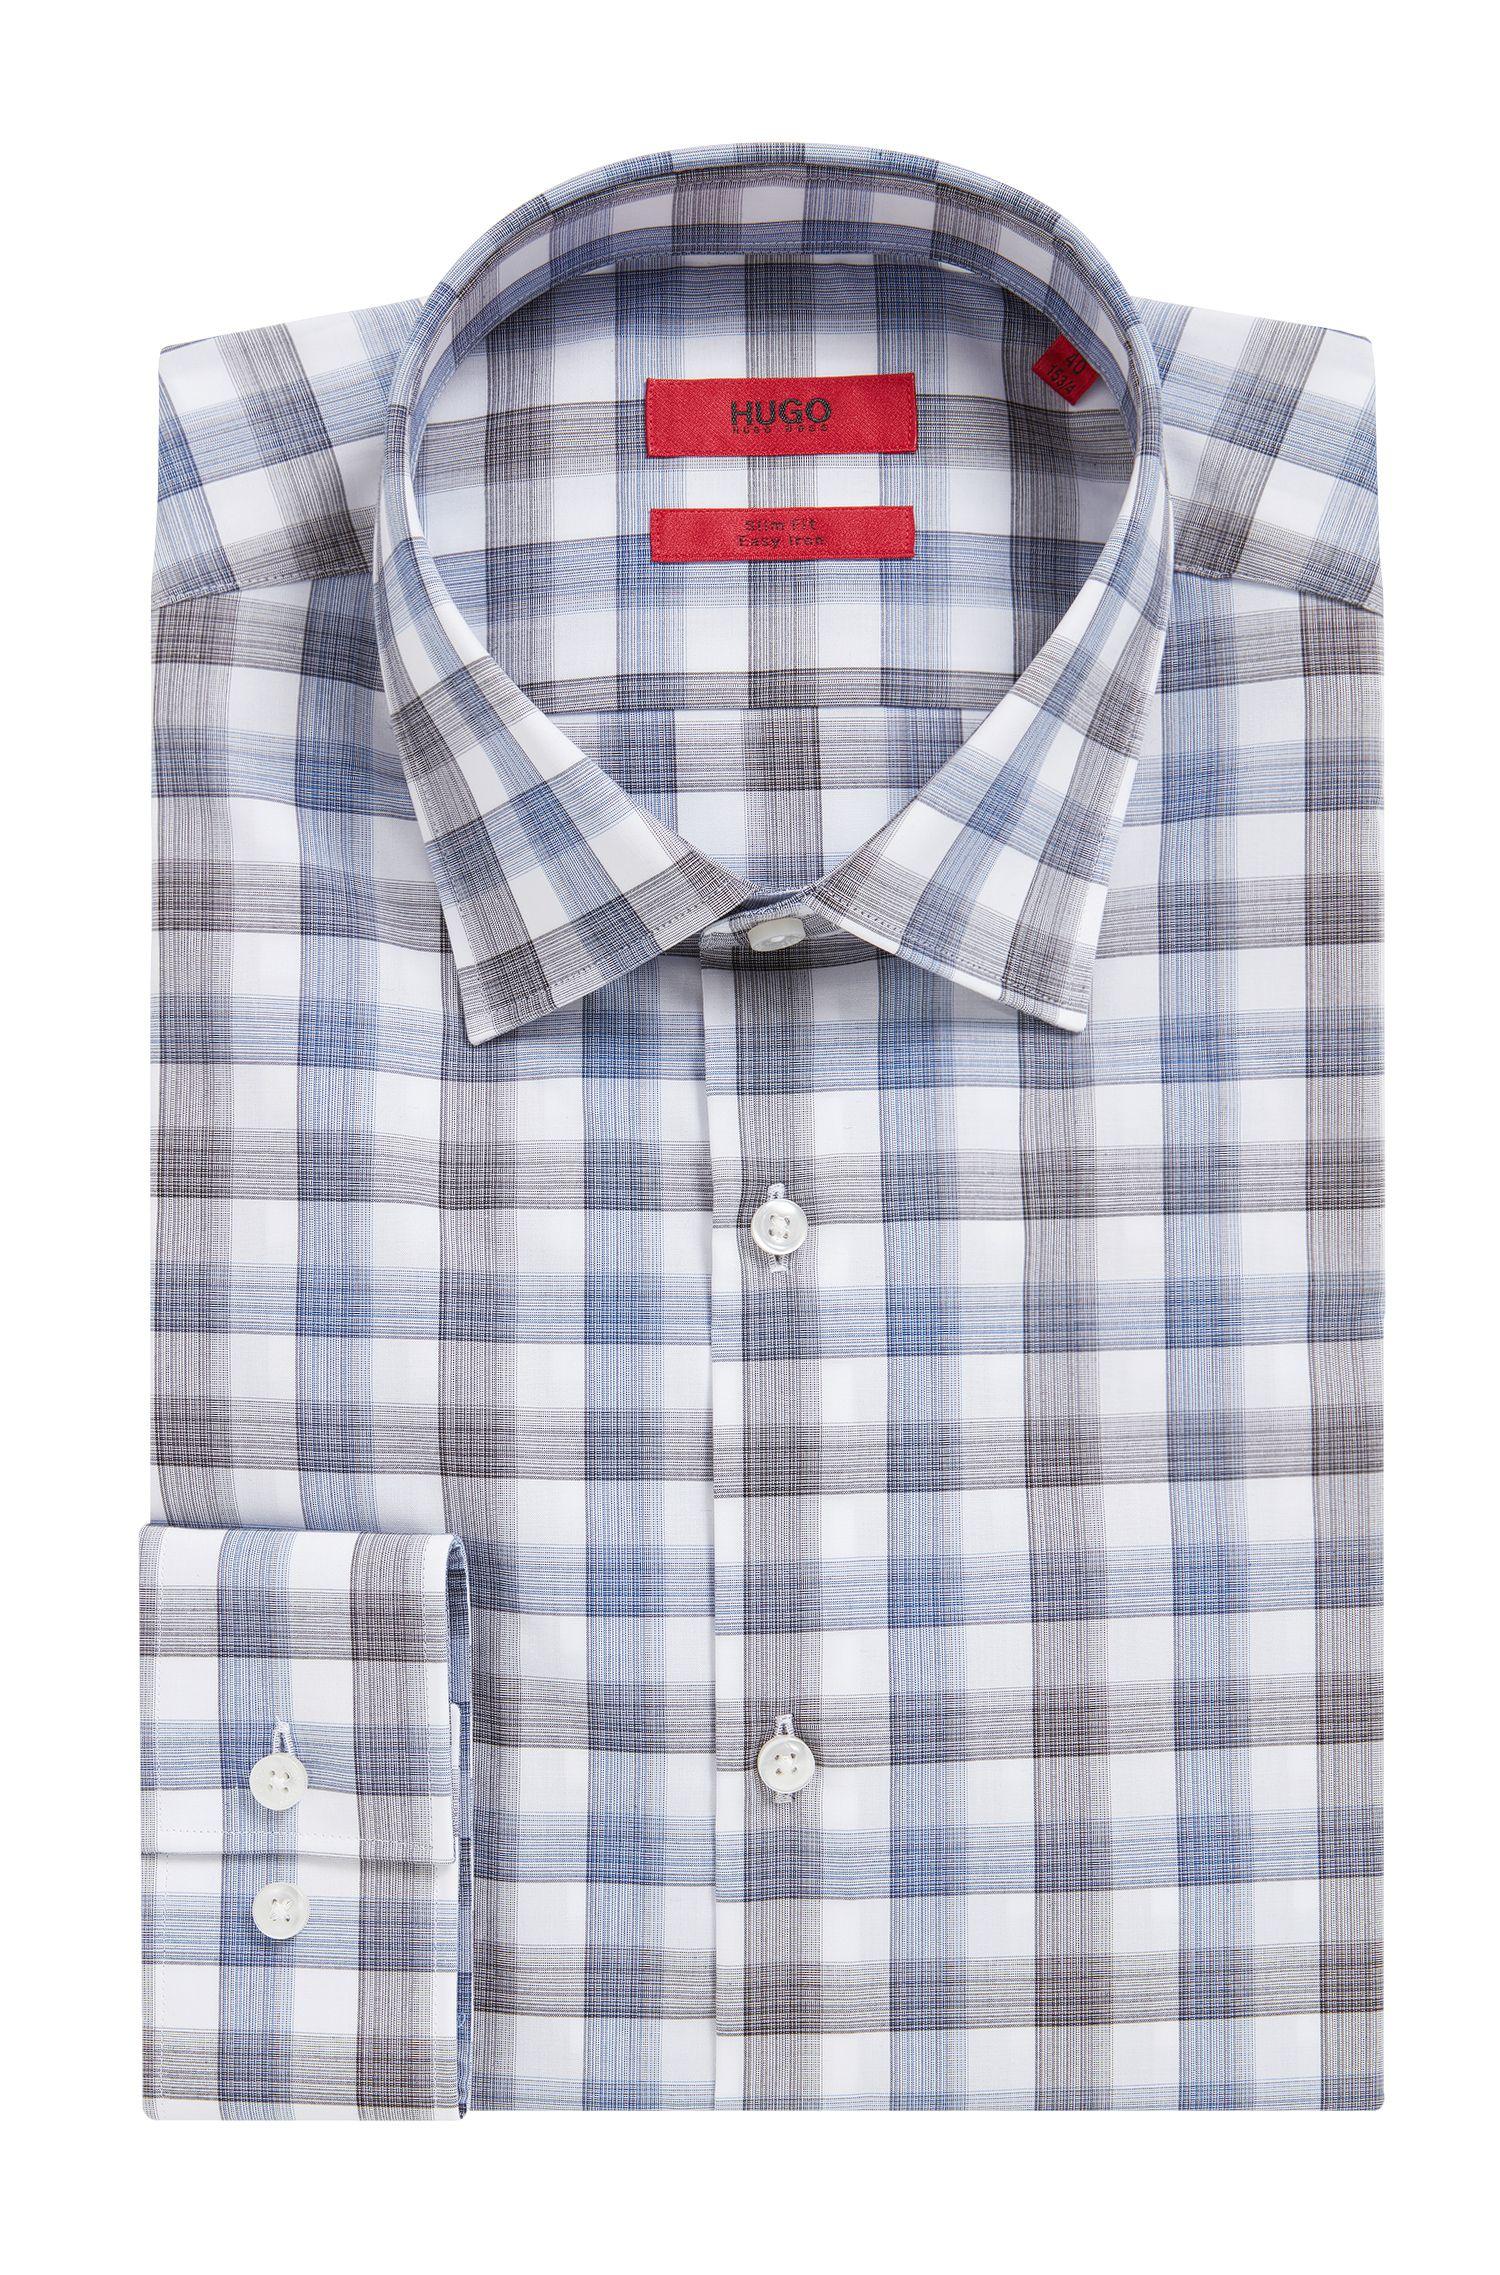 'C-Jenno' | Slim Fit, Brushed Check Easy Iron Cotton Dress Shirt